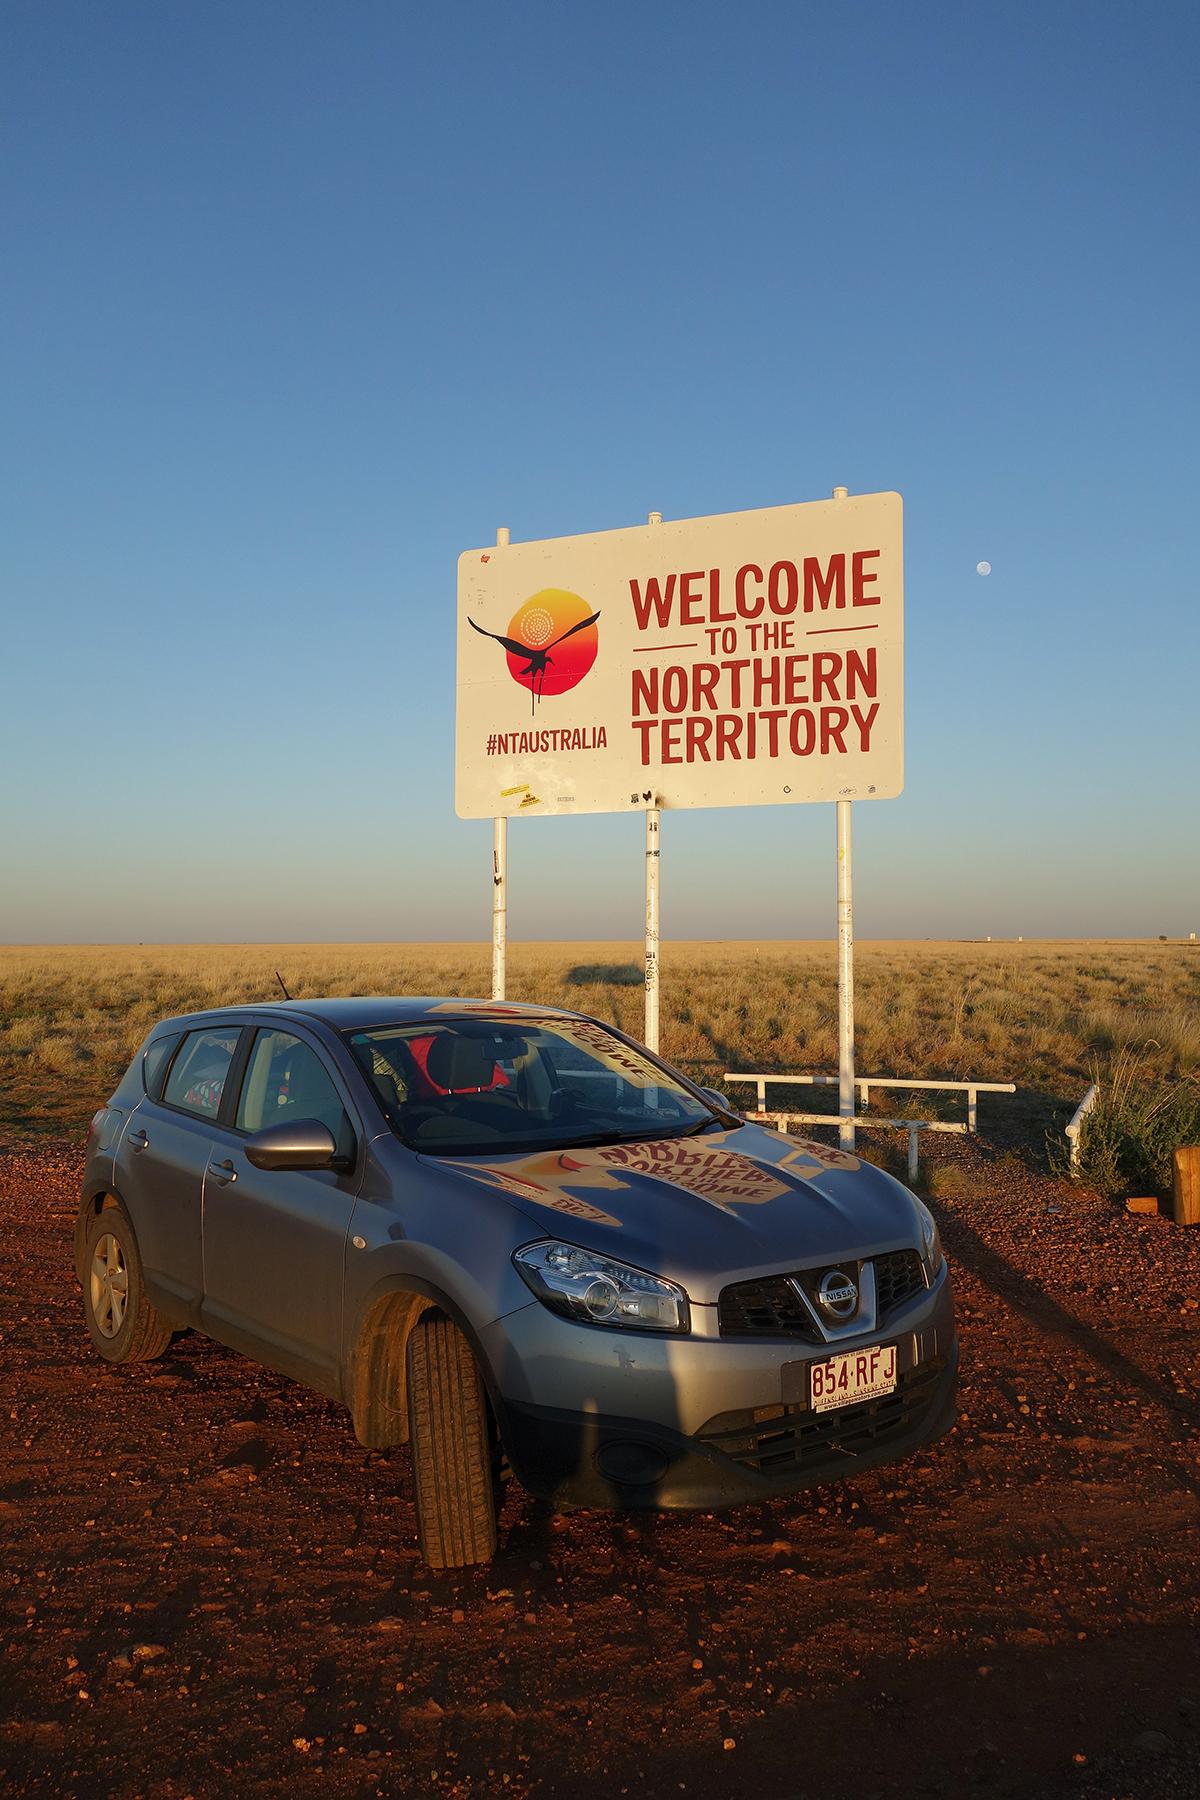 The obligatory border crossing photo